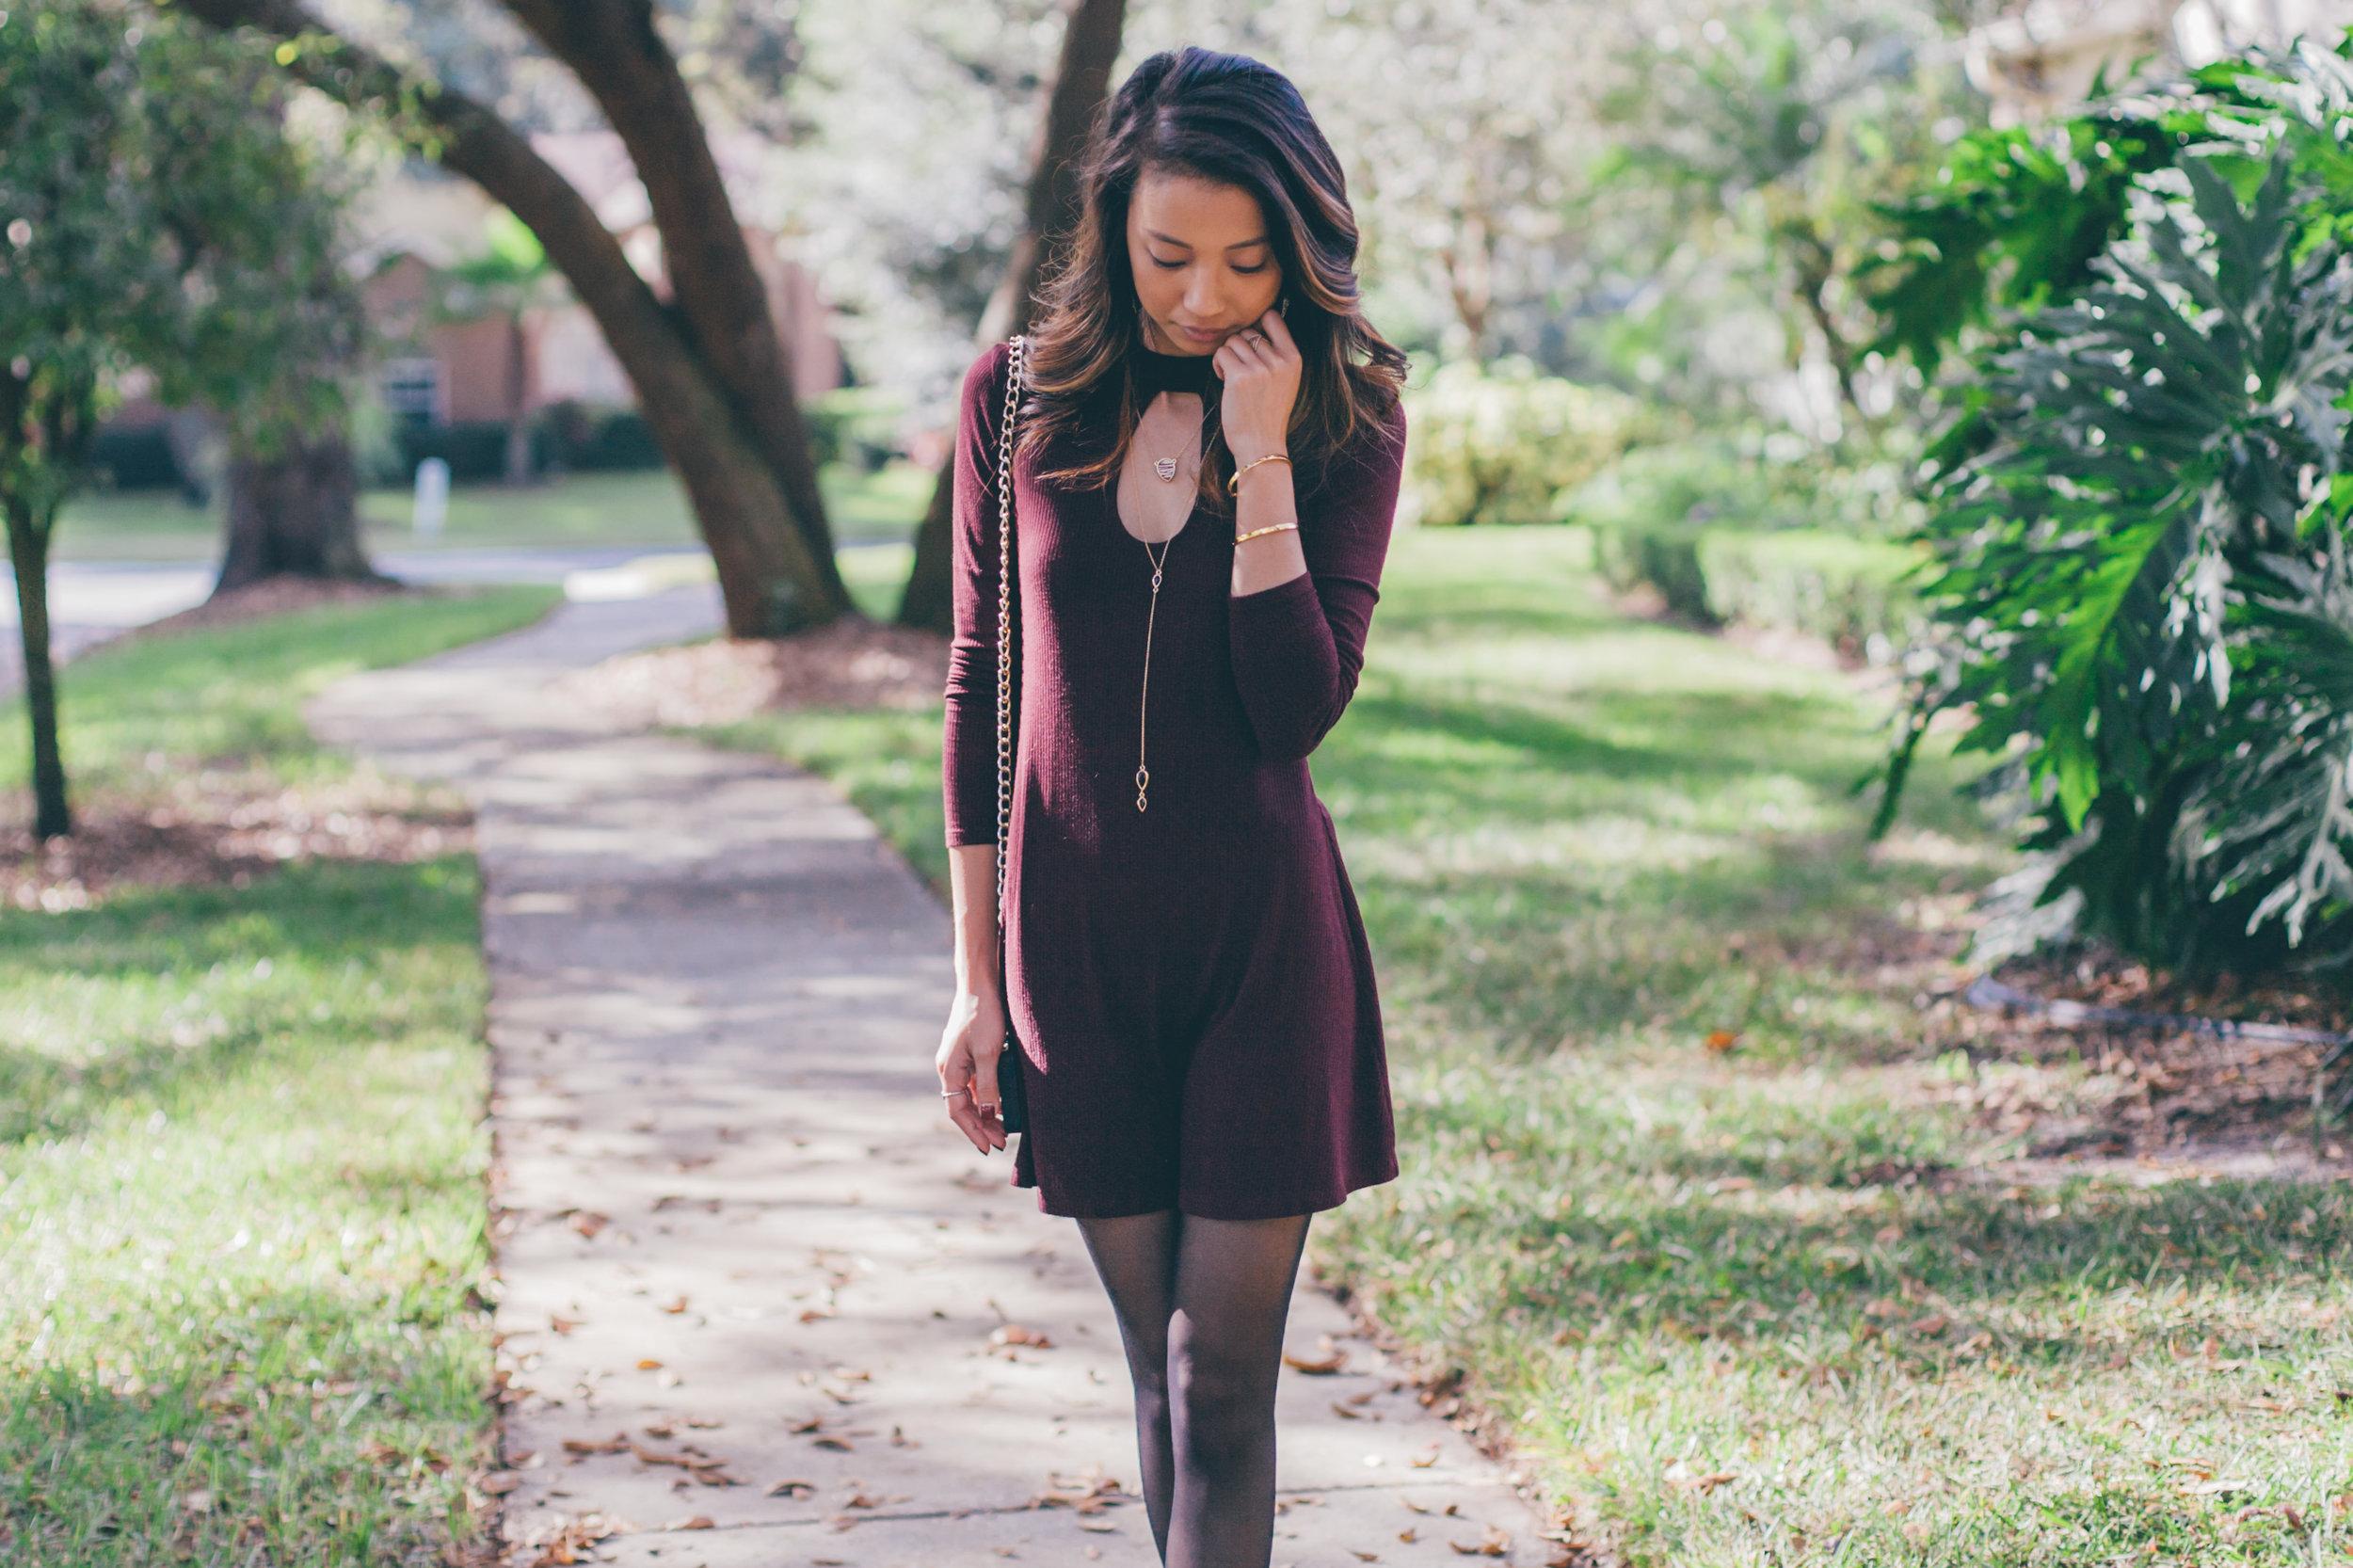 This Jenn Girl - Keyhole Dress 2